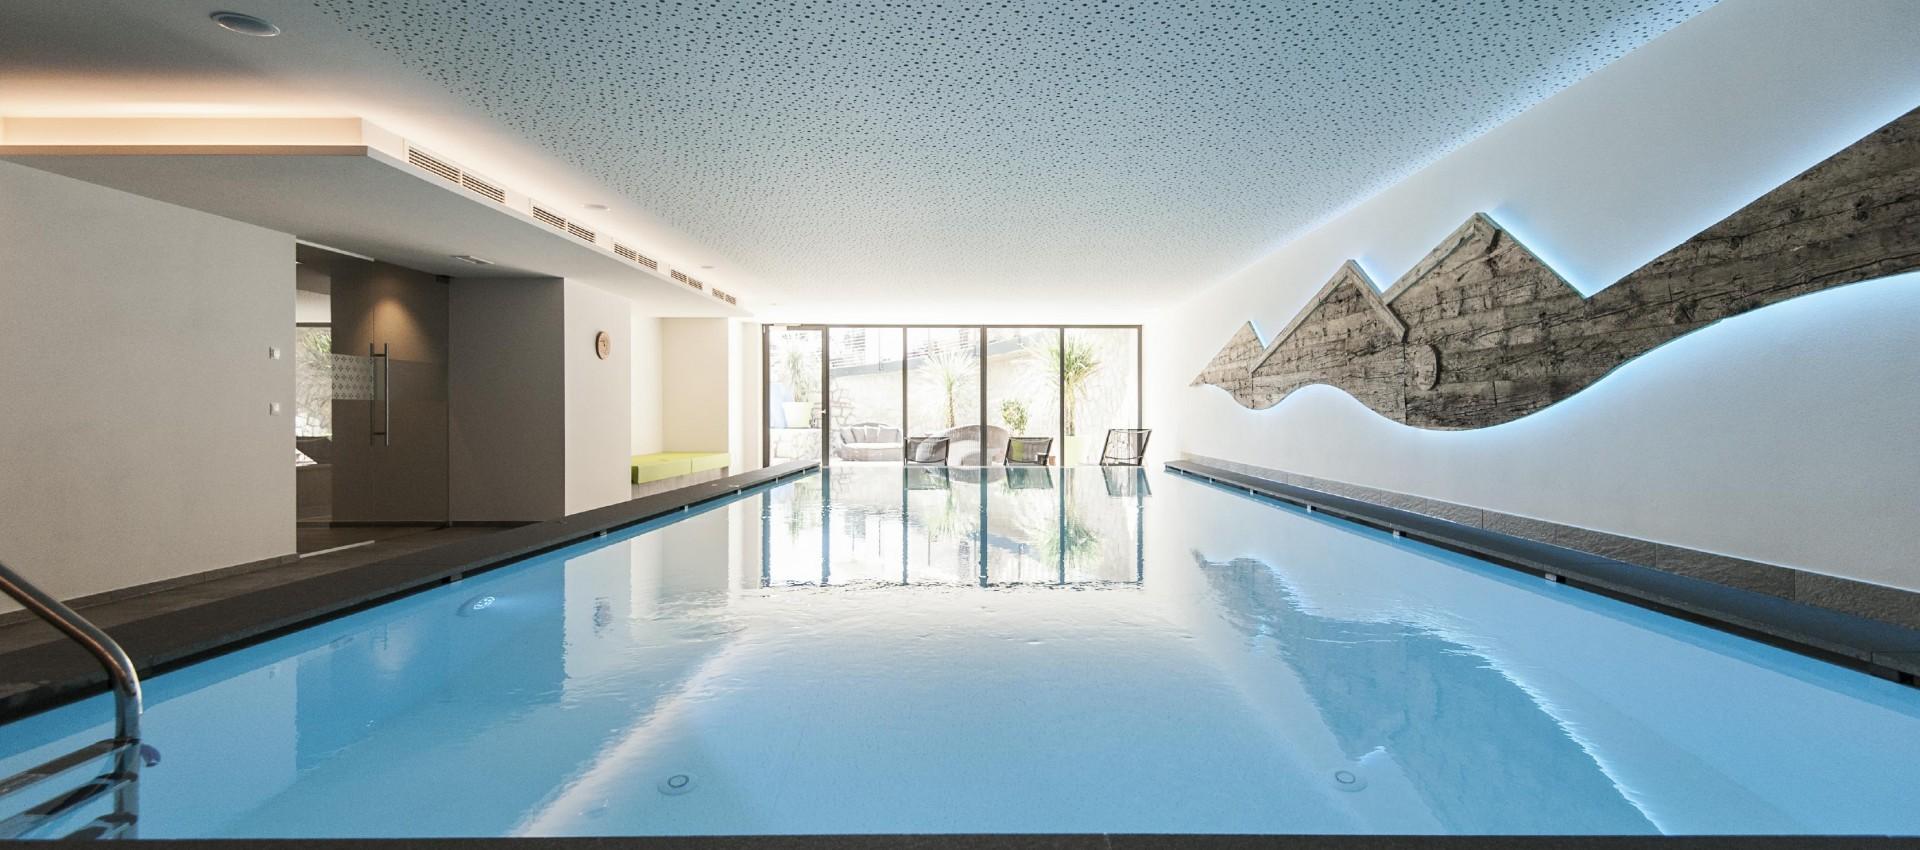 Indoor Pool im Hotel Pfeiss in Lana